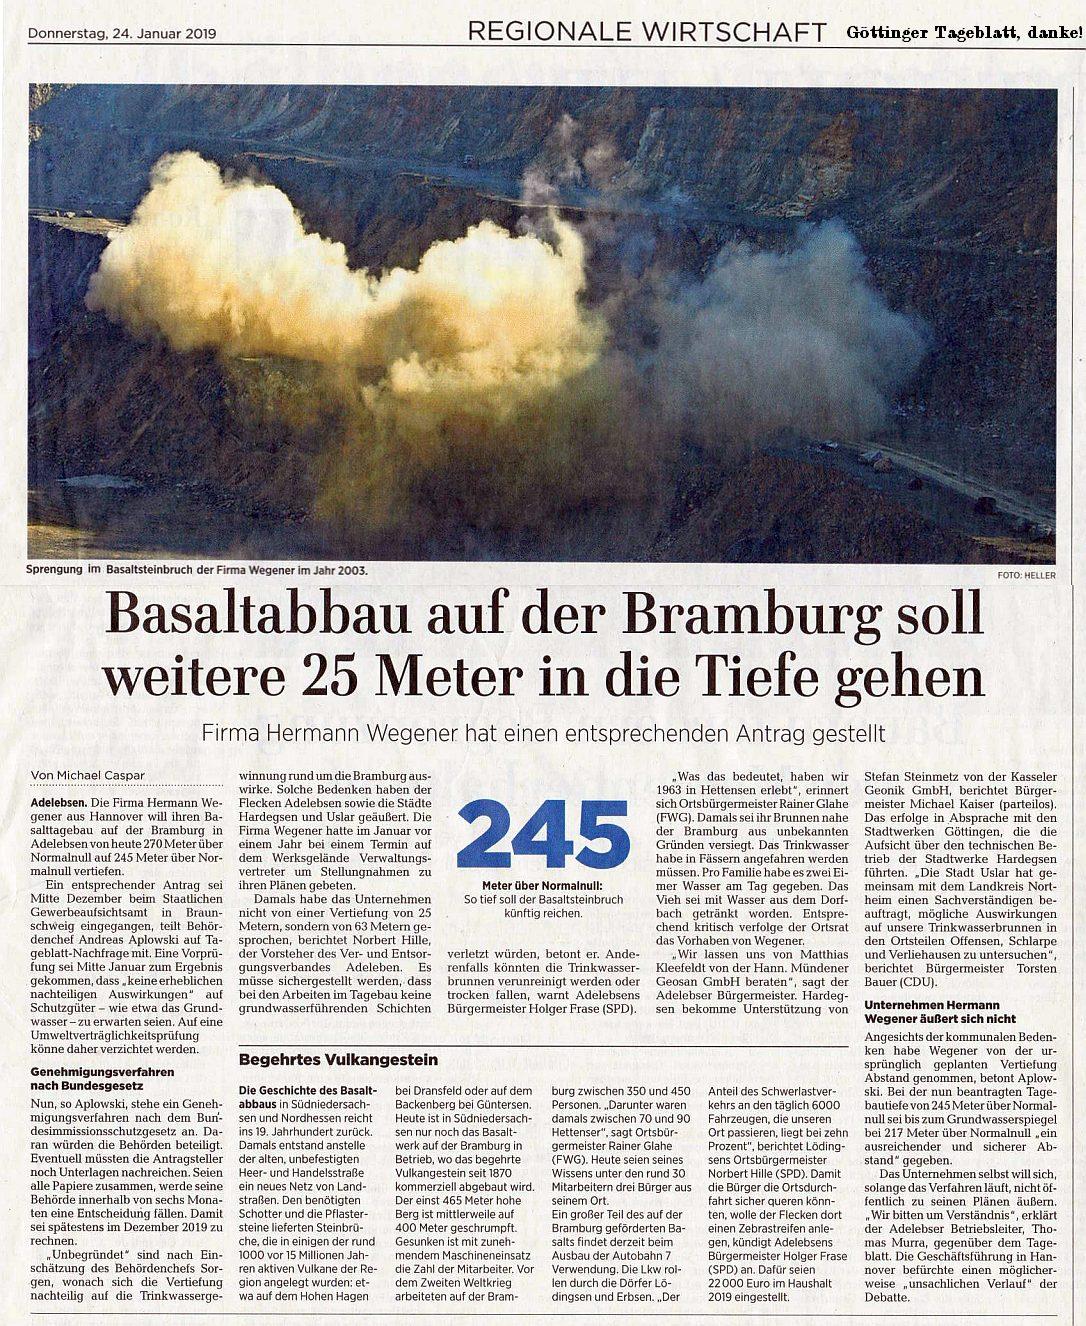 Bramburg, wegener-Basalt